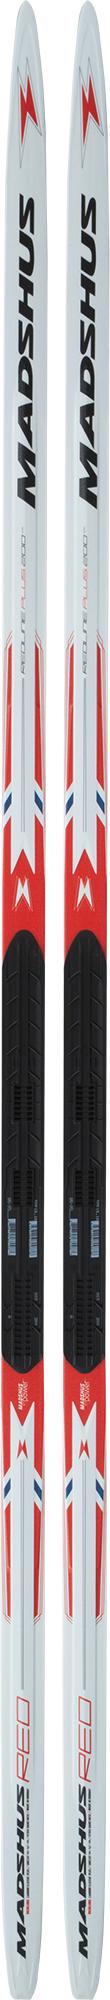 Madshus Беговые лыжи Madshus Redline Carbon Classic Plus беговые лыжи tisa 90515 top universal 197